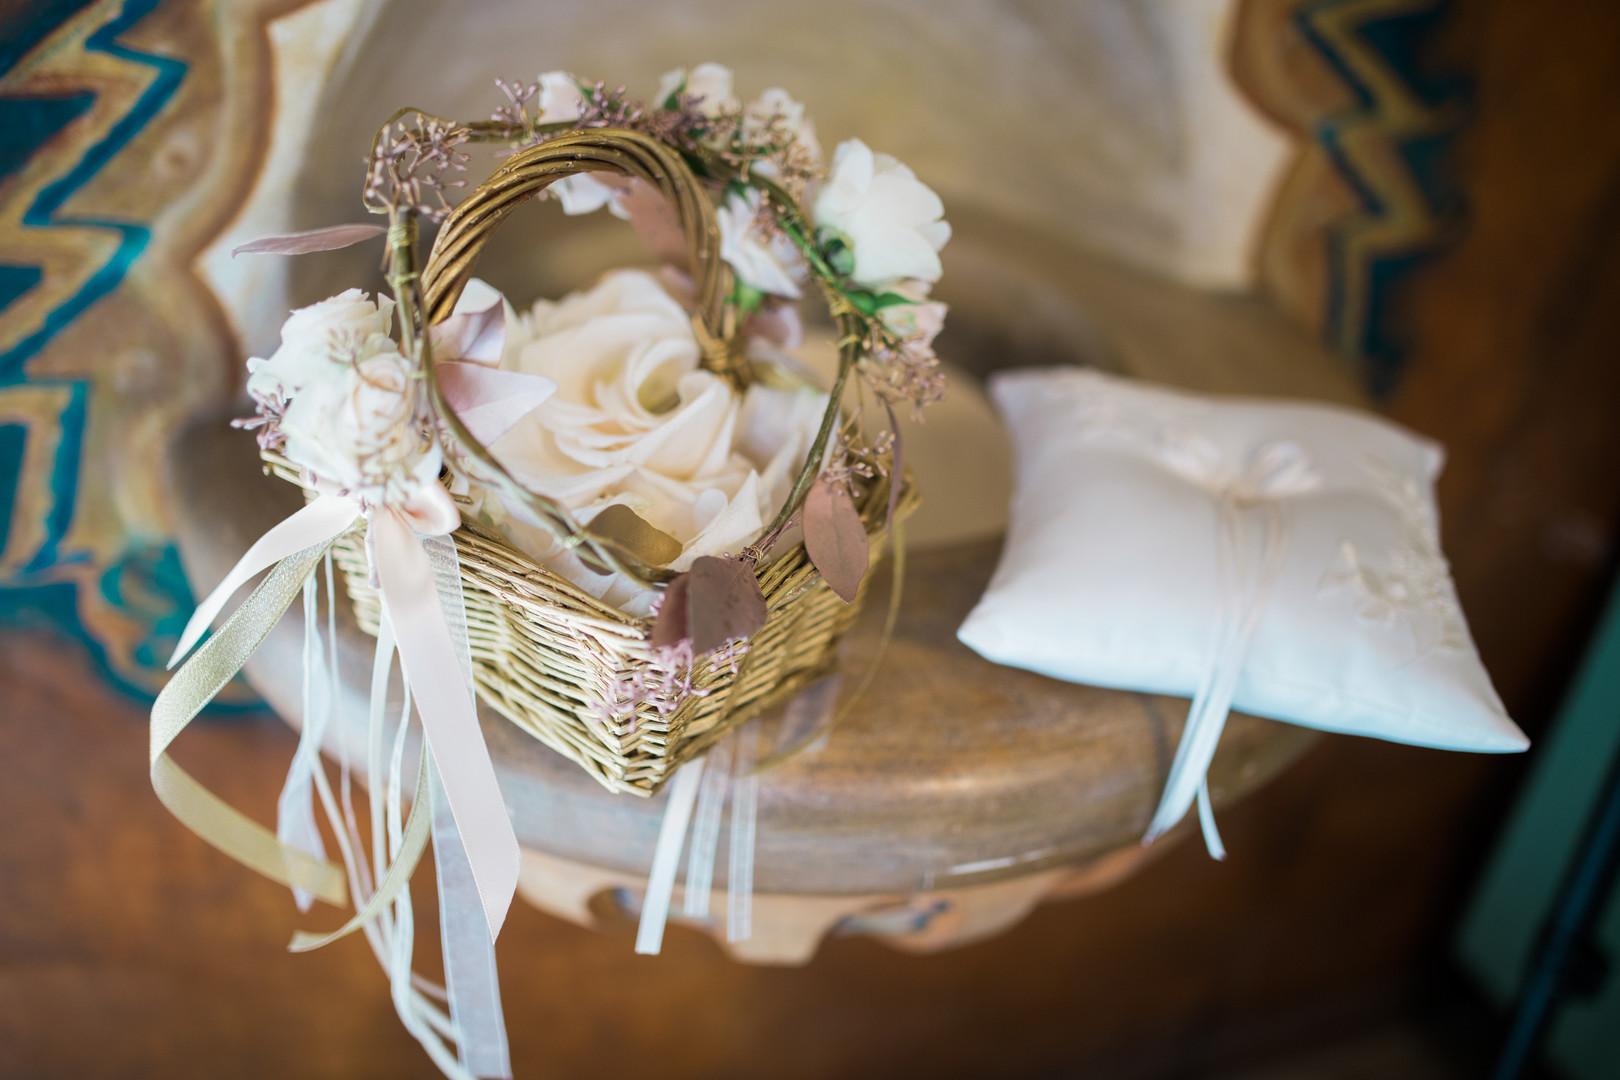 www.santabarbarawedding.com   The Big Affair   Four Seasons The Biltmore Santa Barbara   Asiel Designs   Flower Girl Basket and Ring Bearer Pillow